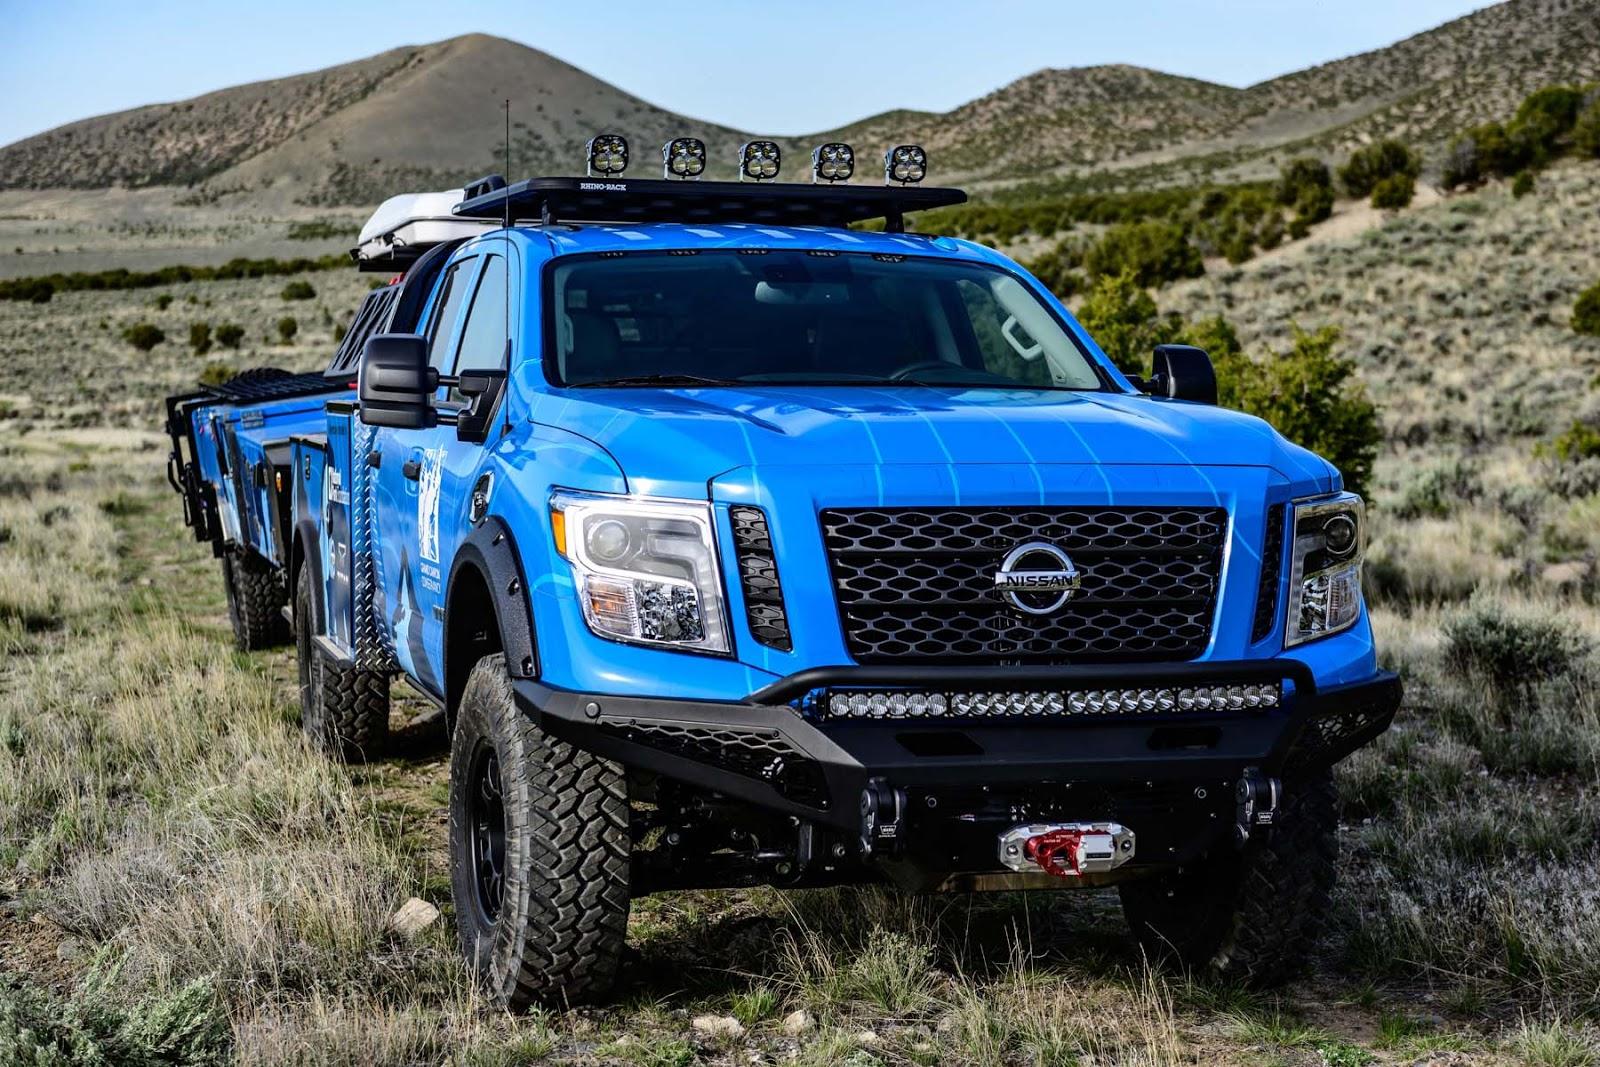 Ultimate Parks TITAN 13 1 Η Nissan δωρίζει τον Τιτάνα της στο Grand Canyon Nissan, Nissan Titan, Nissan TITAN Warrior Concept, Offroad